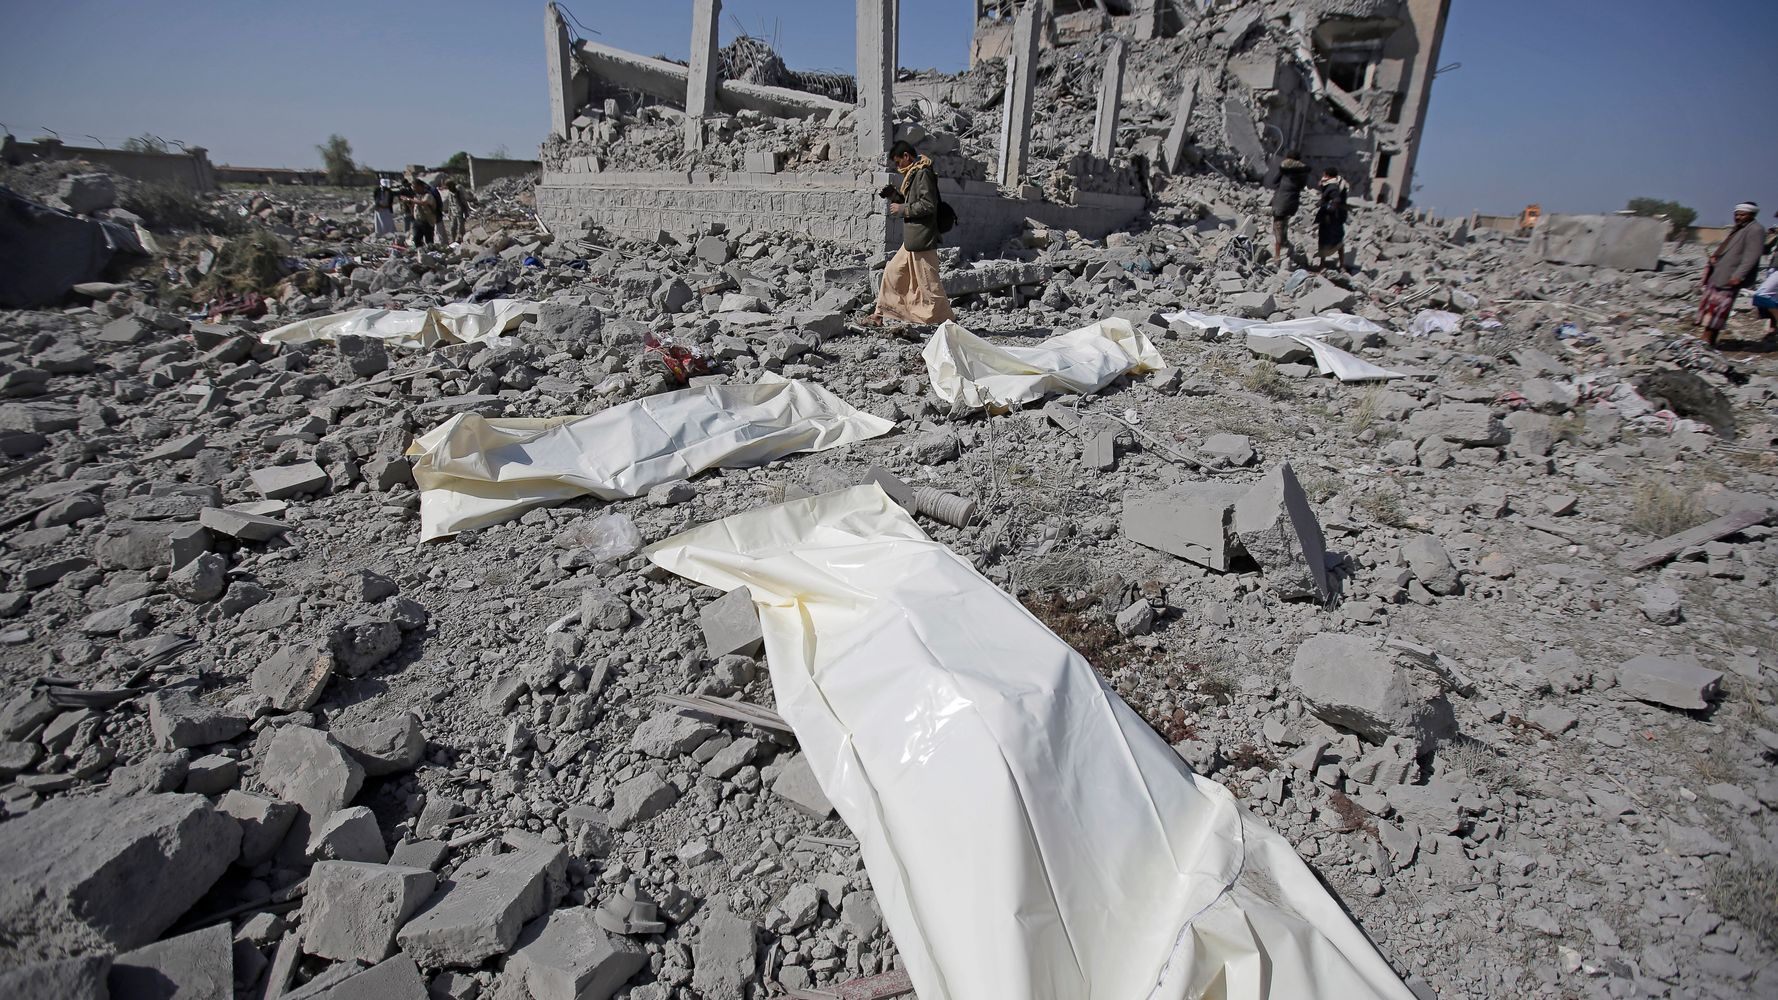 SaudiLed Airstrikes On Yemen Prison Kill At Least 100